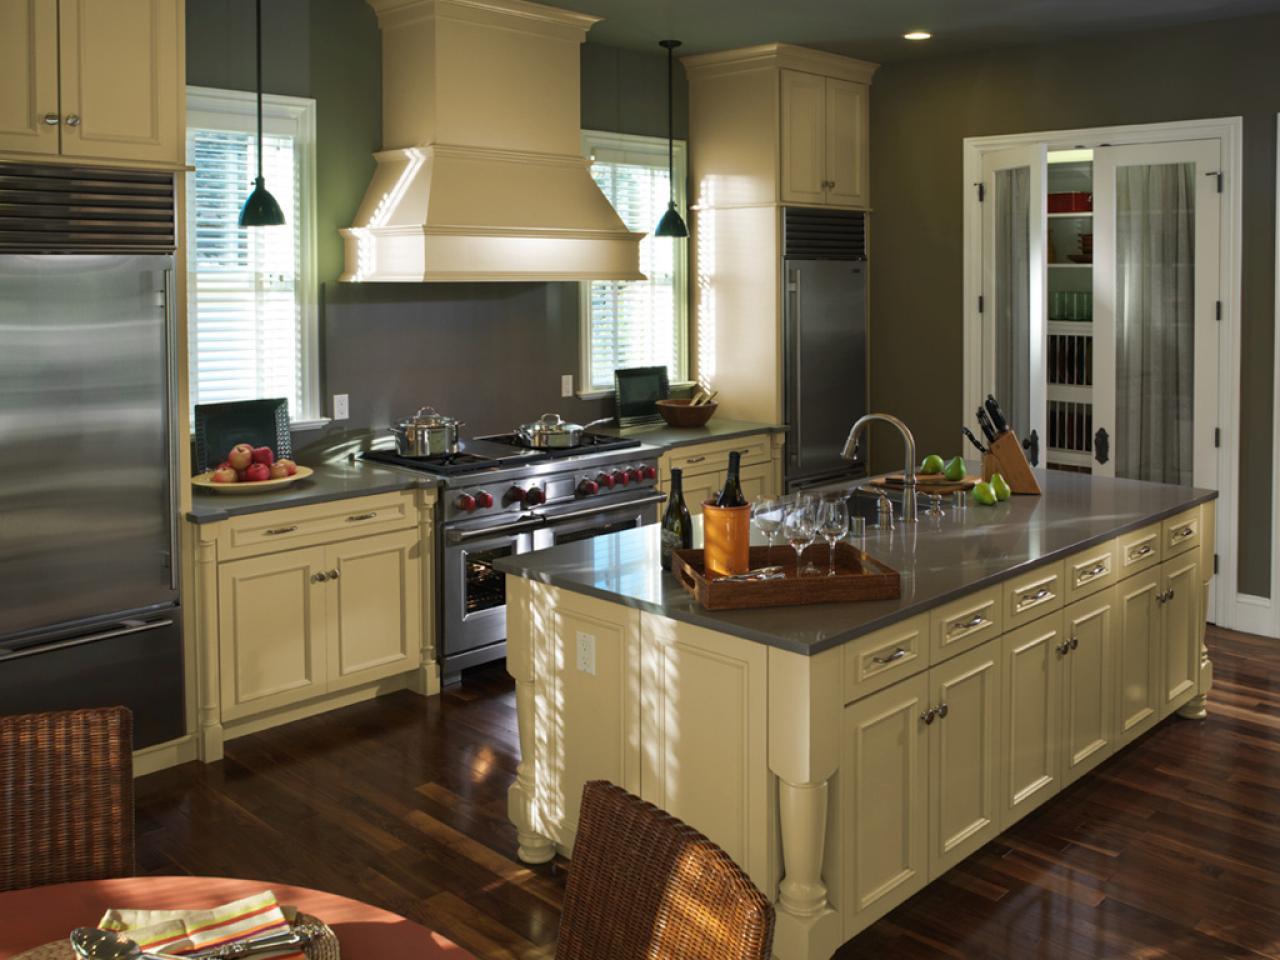 amazing-best-kitchen-countertops-sxjpgrendhgtvcom-at-kitchen-counter